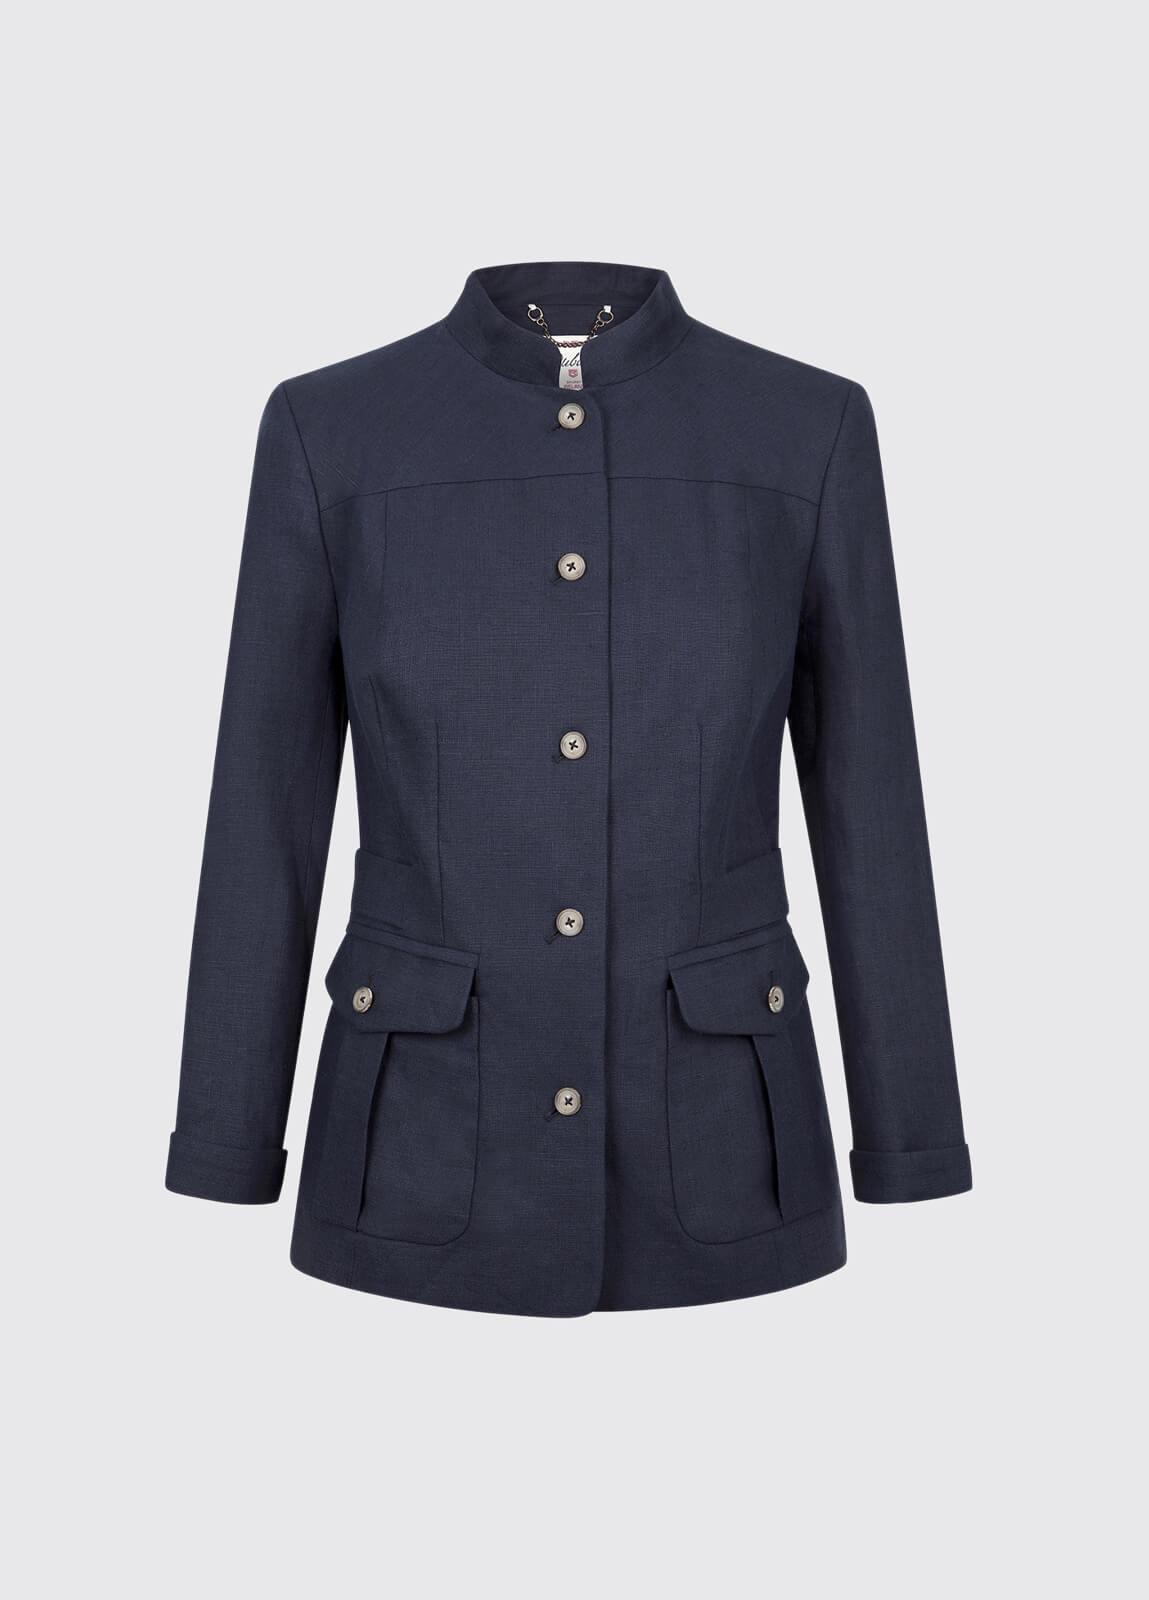 Malahide Women's Linen Jacket - Navy